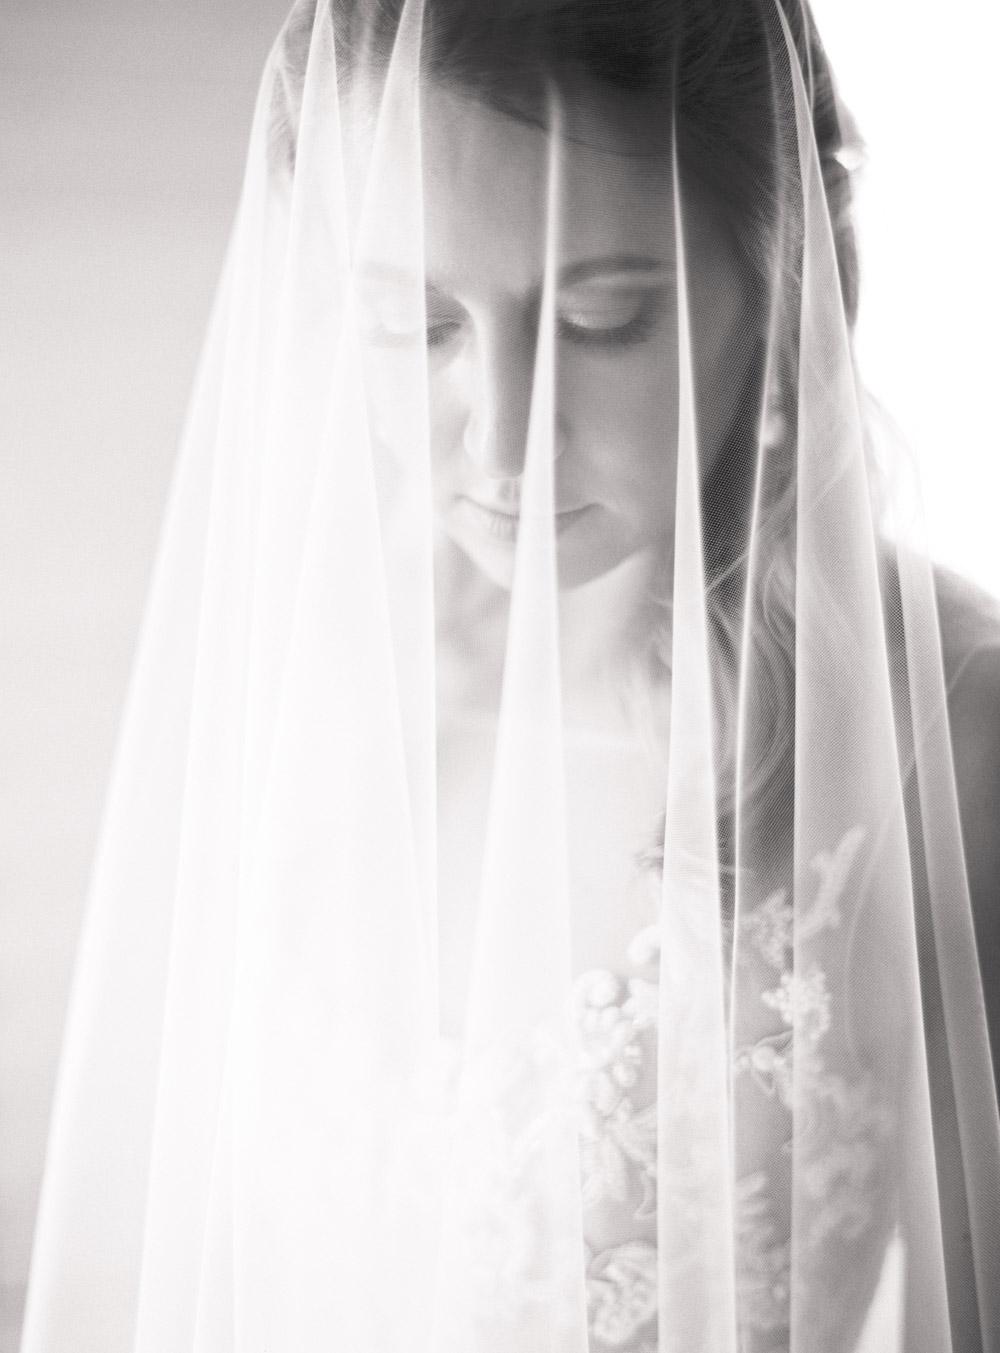 Katie Grant Photography (12 of 127).jpg